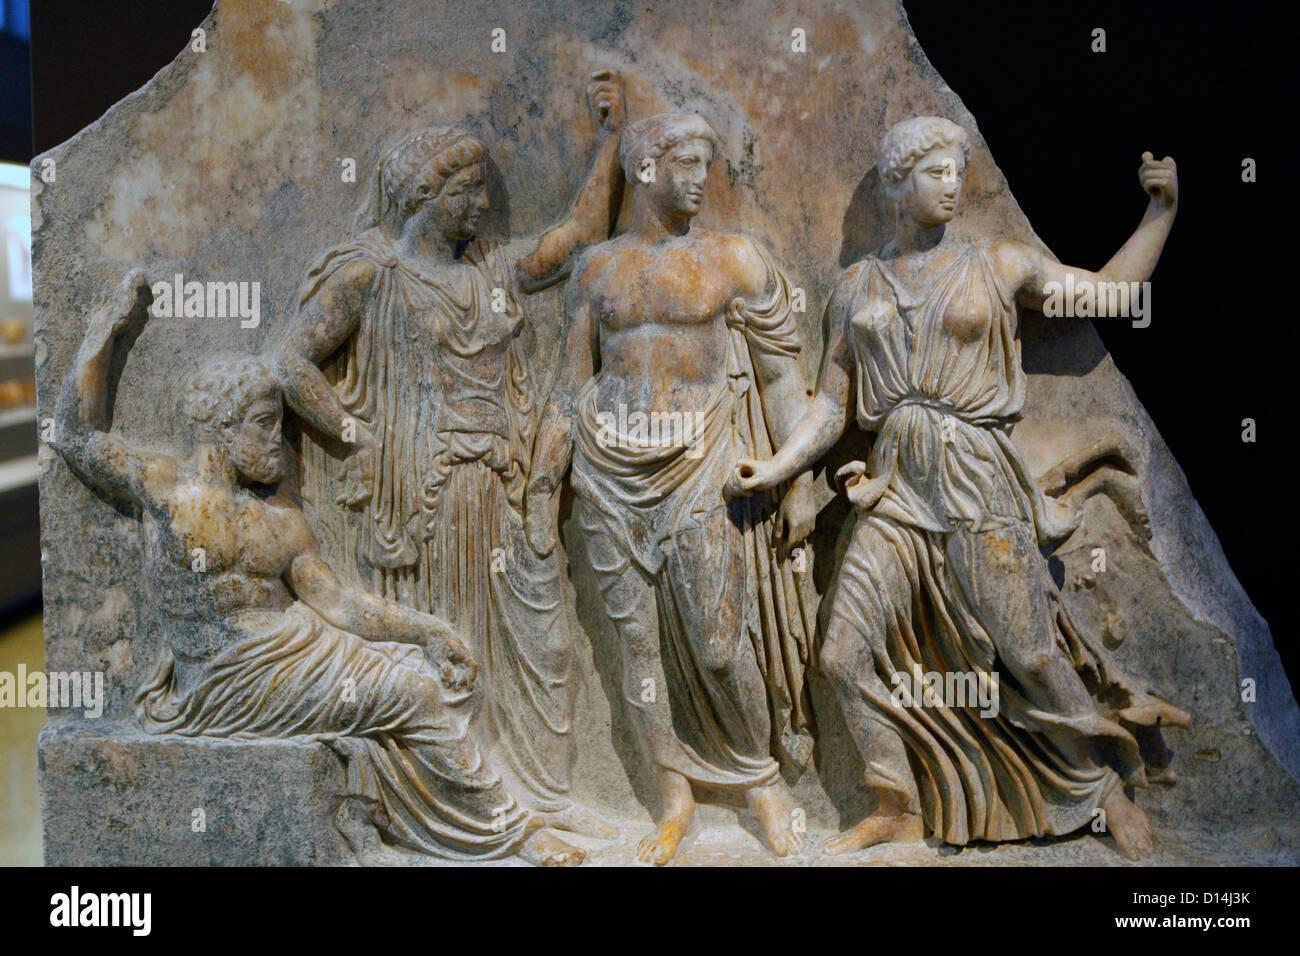 Zeus Apollo and Artemis - Pics about space